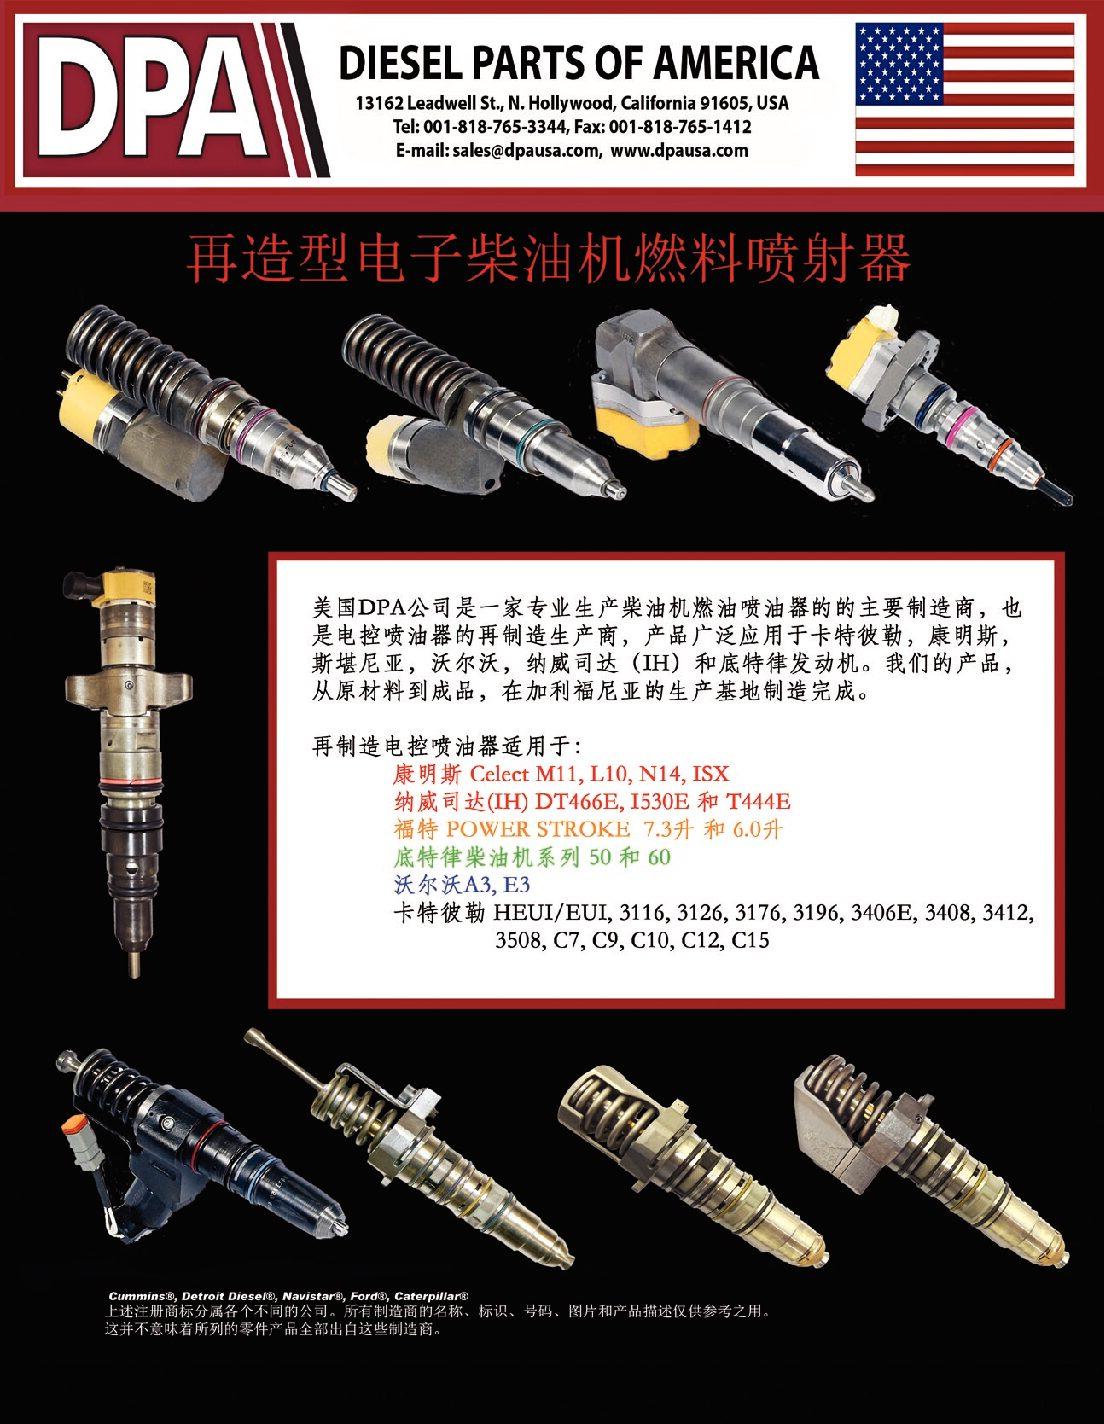 dpa_chinese_brochure-pdf.jpg